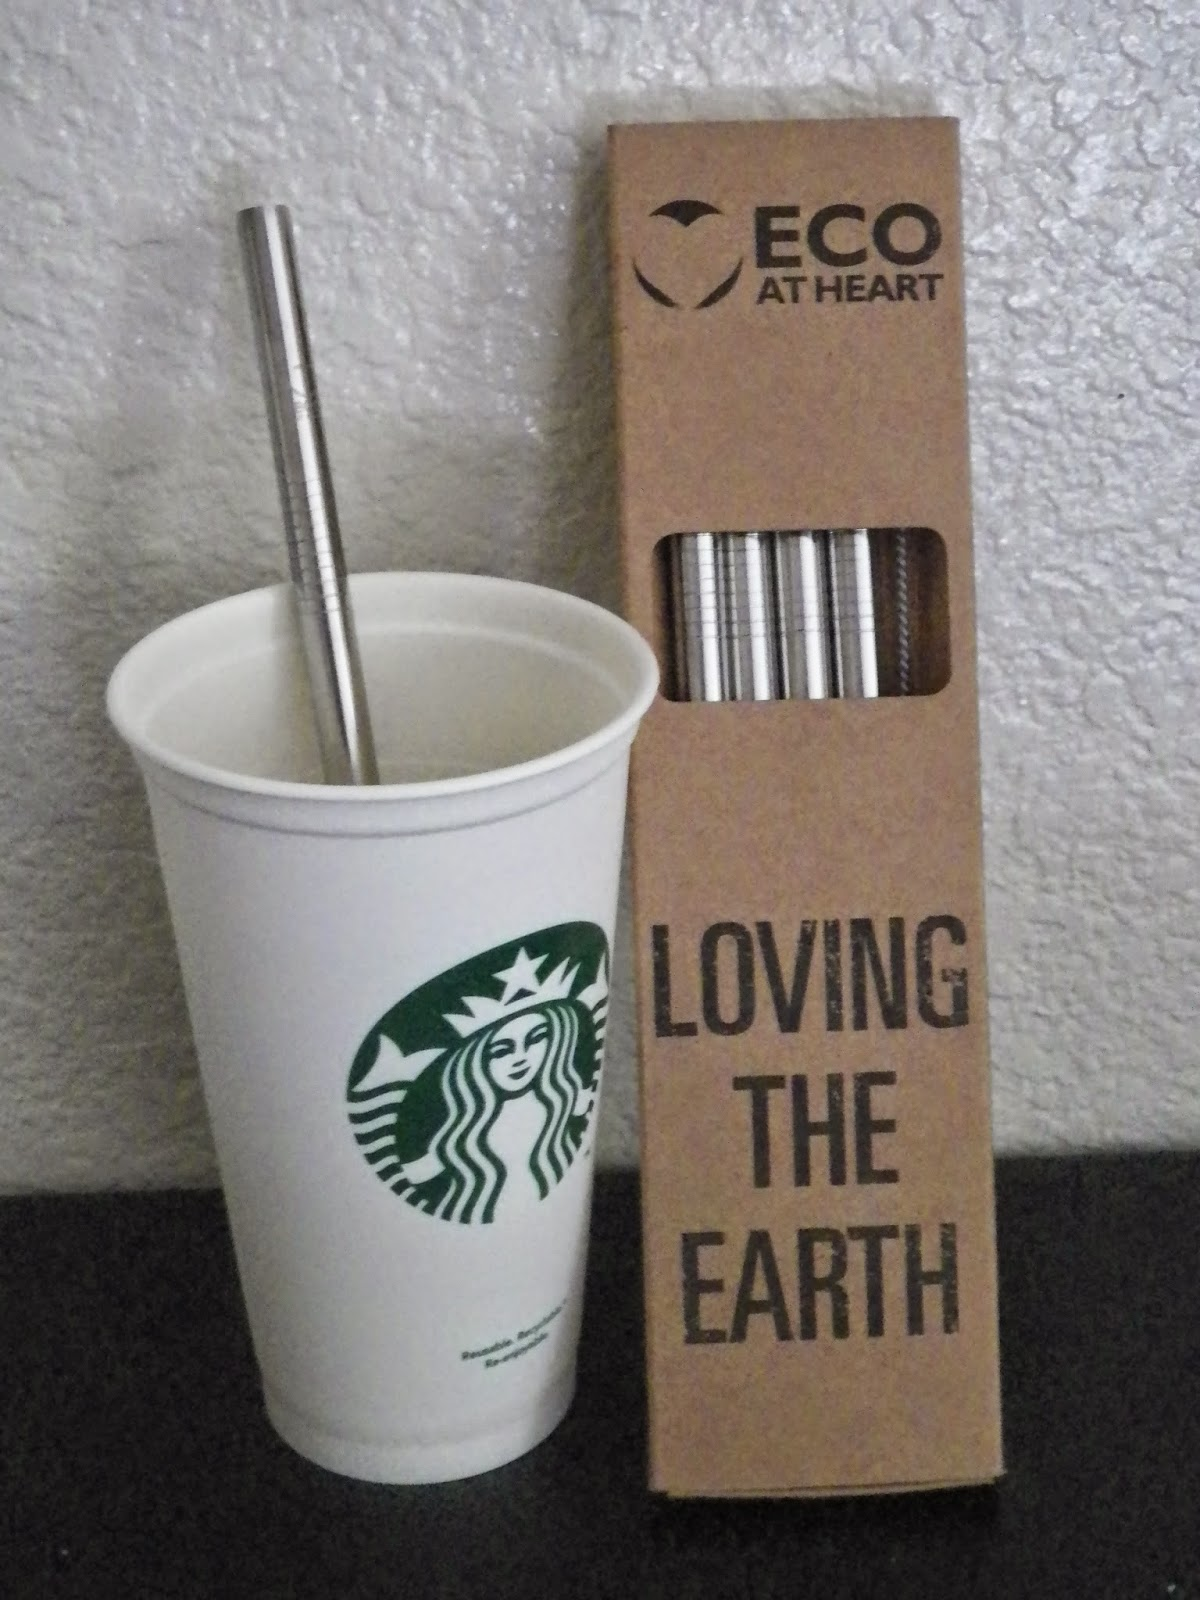 EcoatHeartStainlessSteelDrinkingStraws.jpg